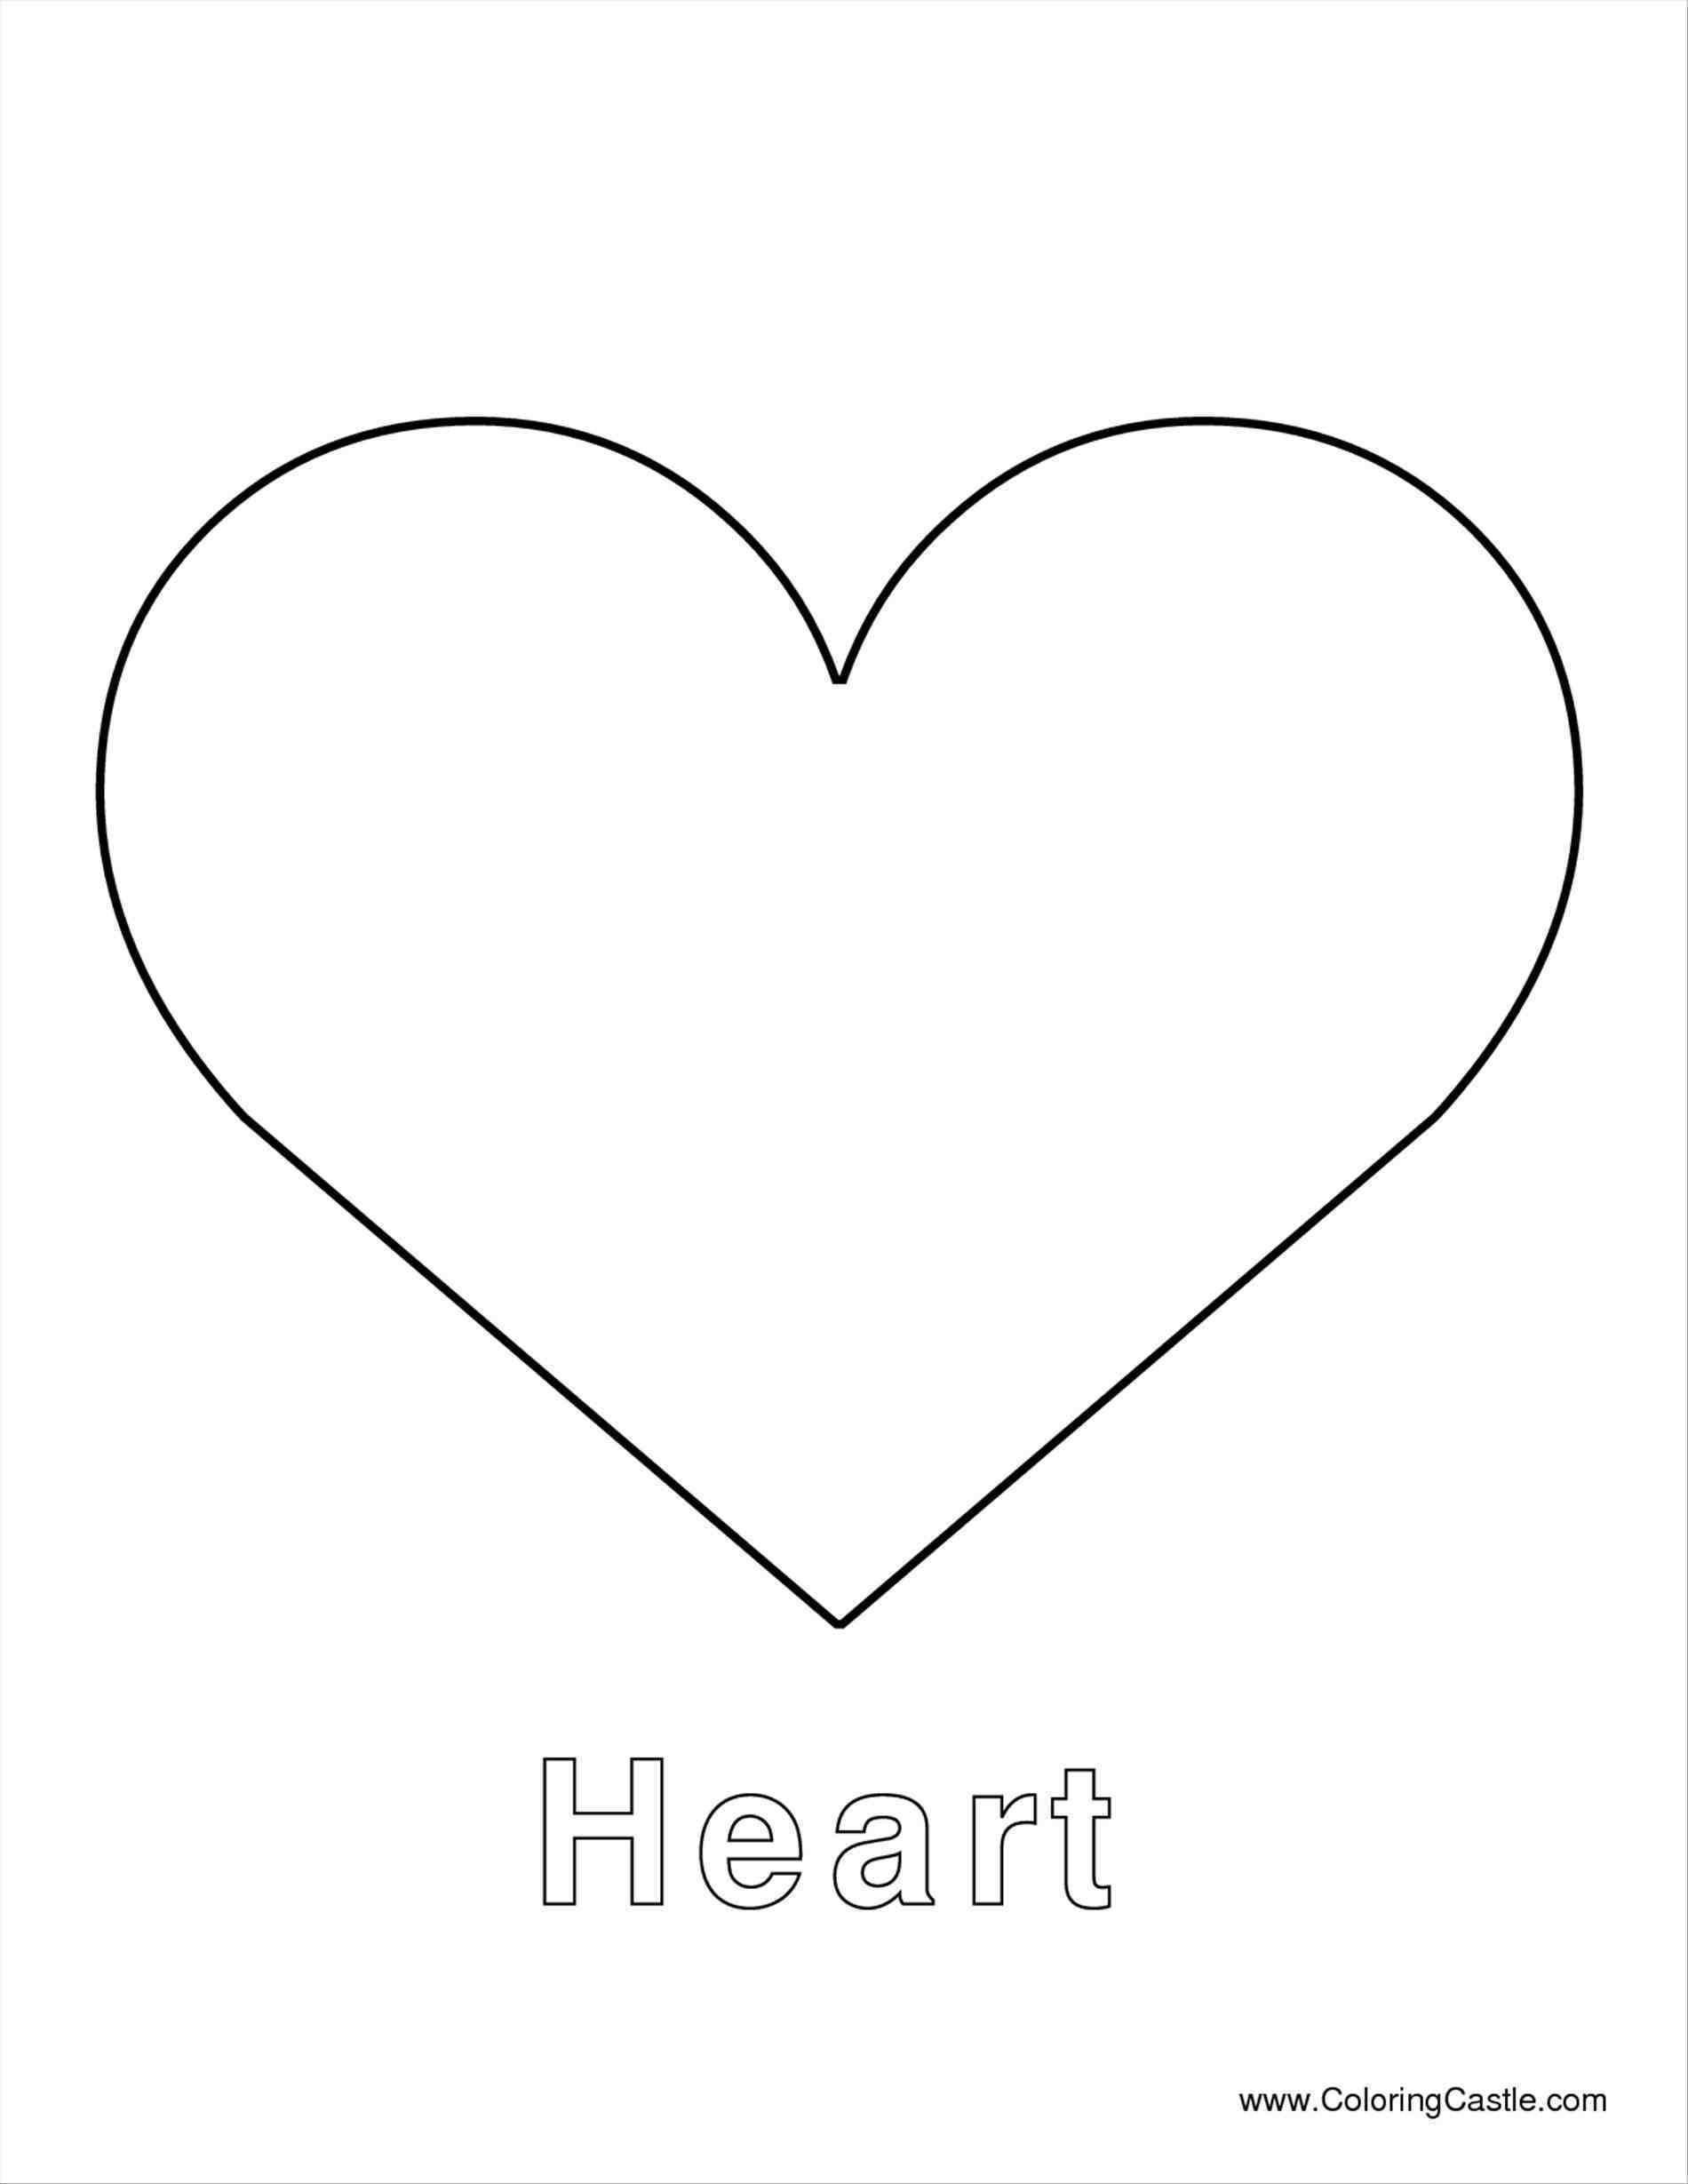 Full Page Heart Template Heart Template Heart Shapes Template